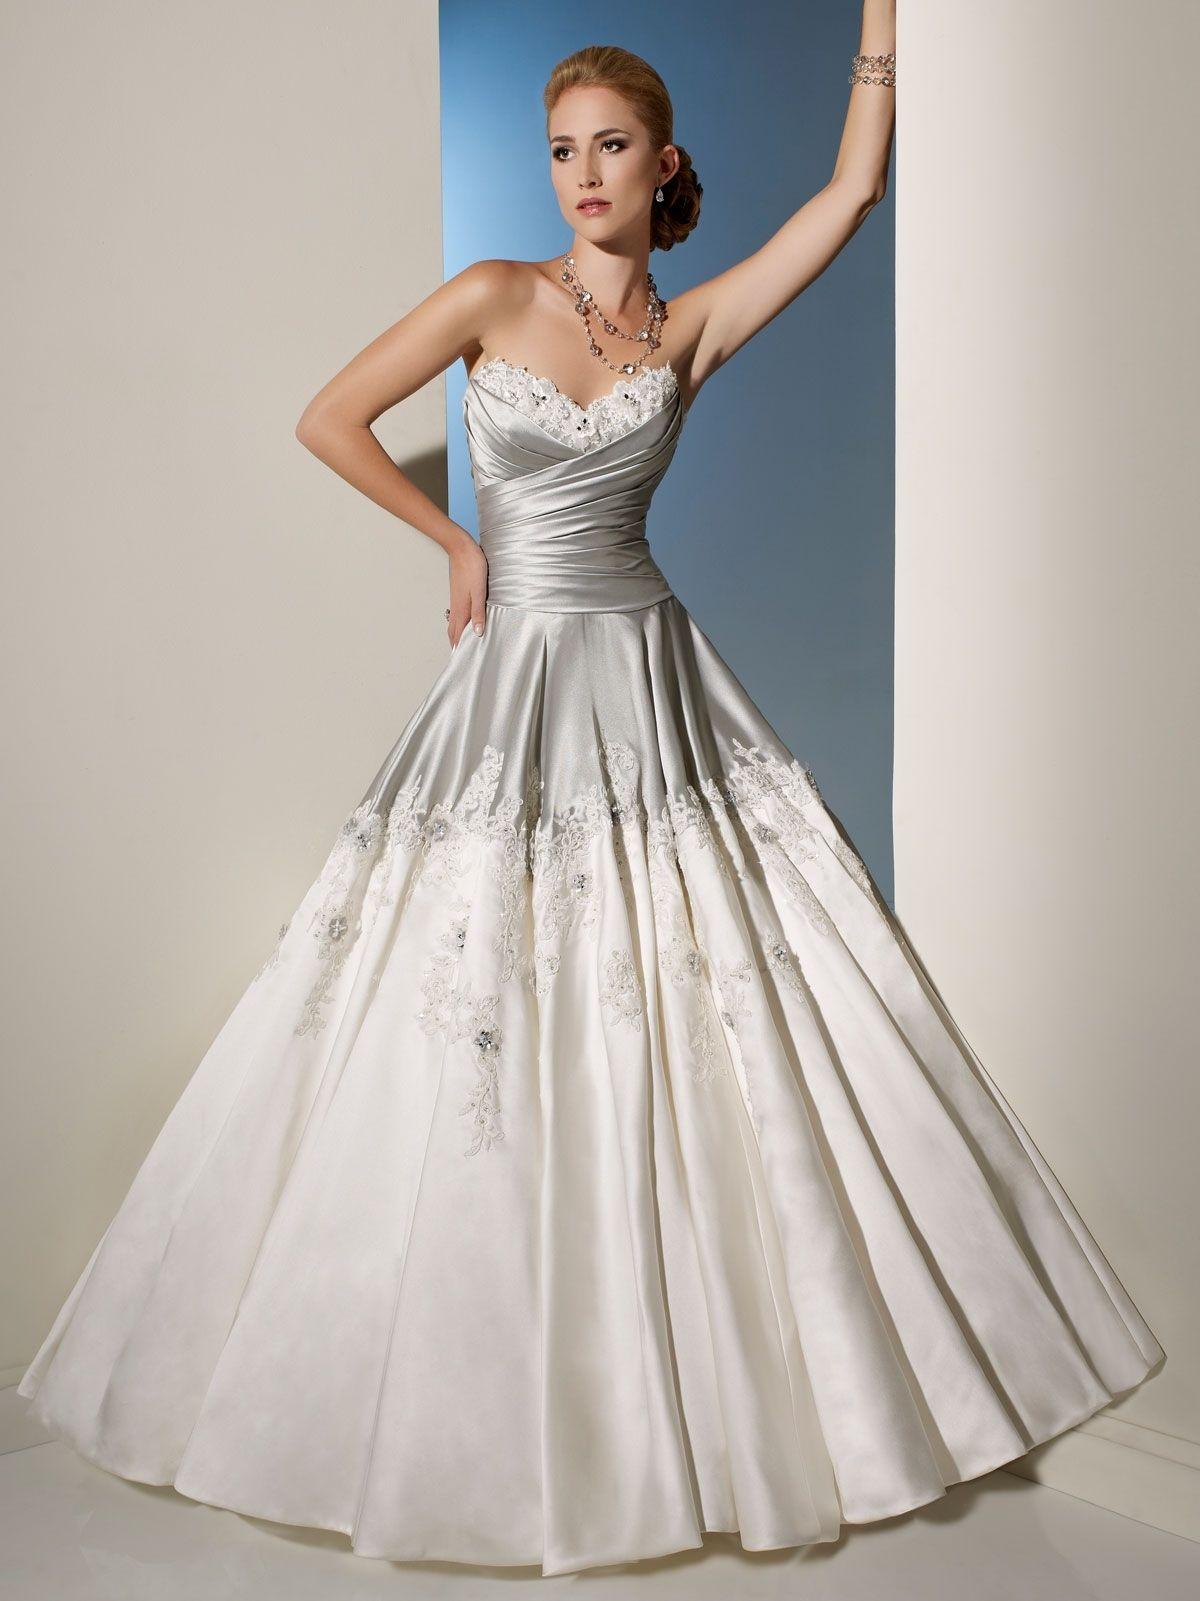 Silver bodice wedding dress wedding dress pinterest bodice